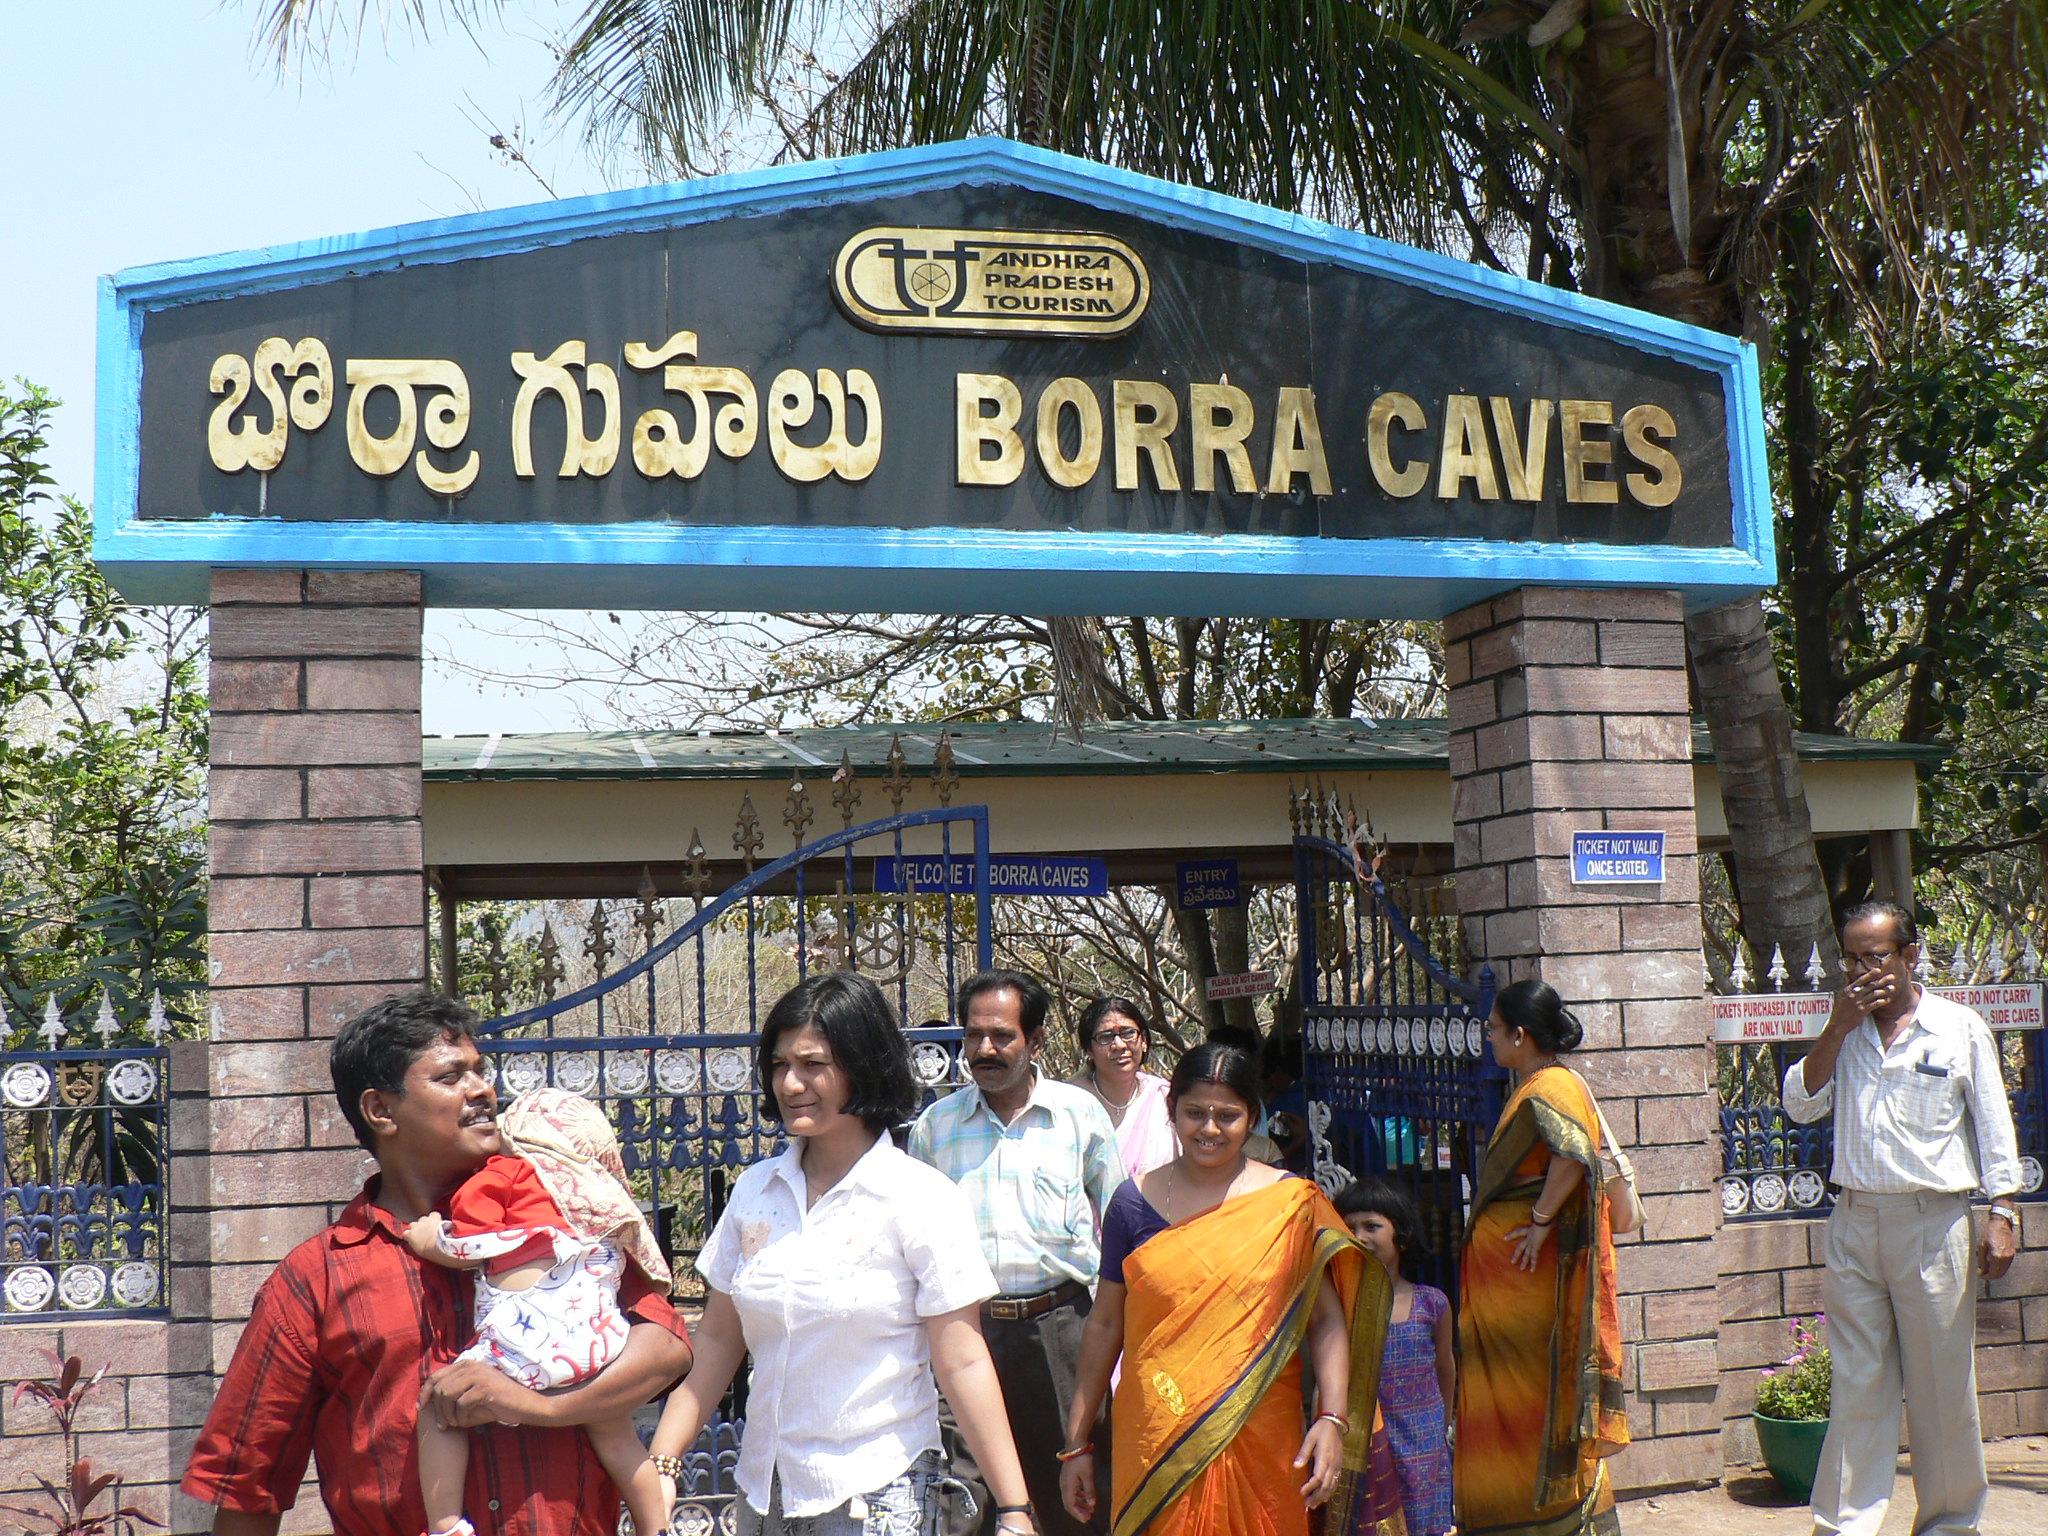 Borra Caves Entrance in Araku Valley Visakhapatnam district in Andhra Pradesh